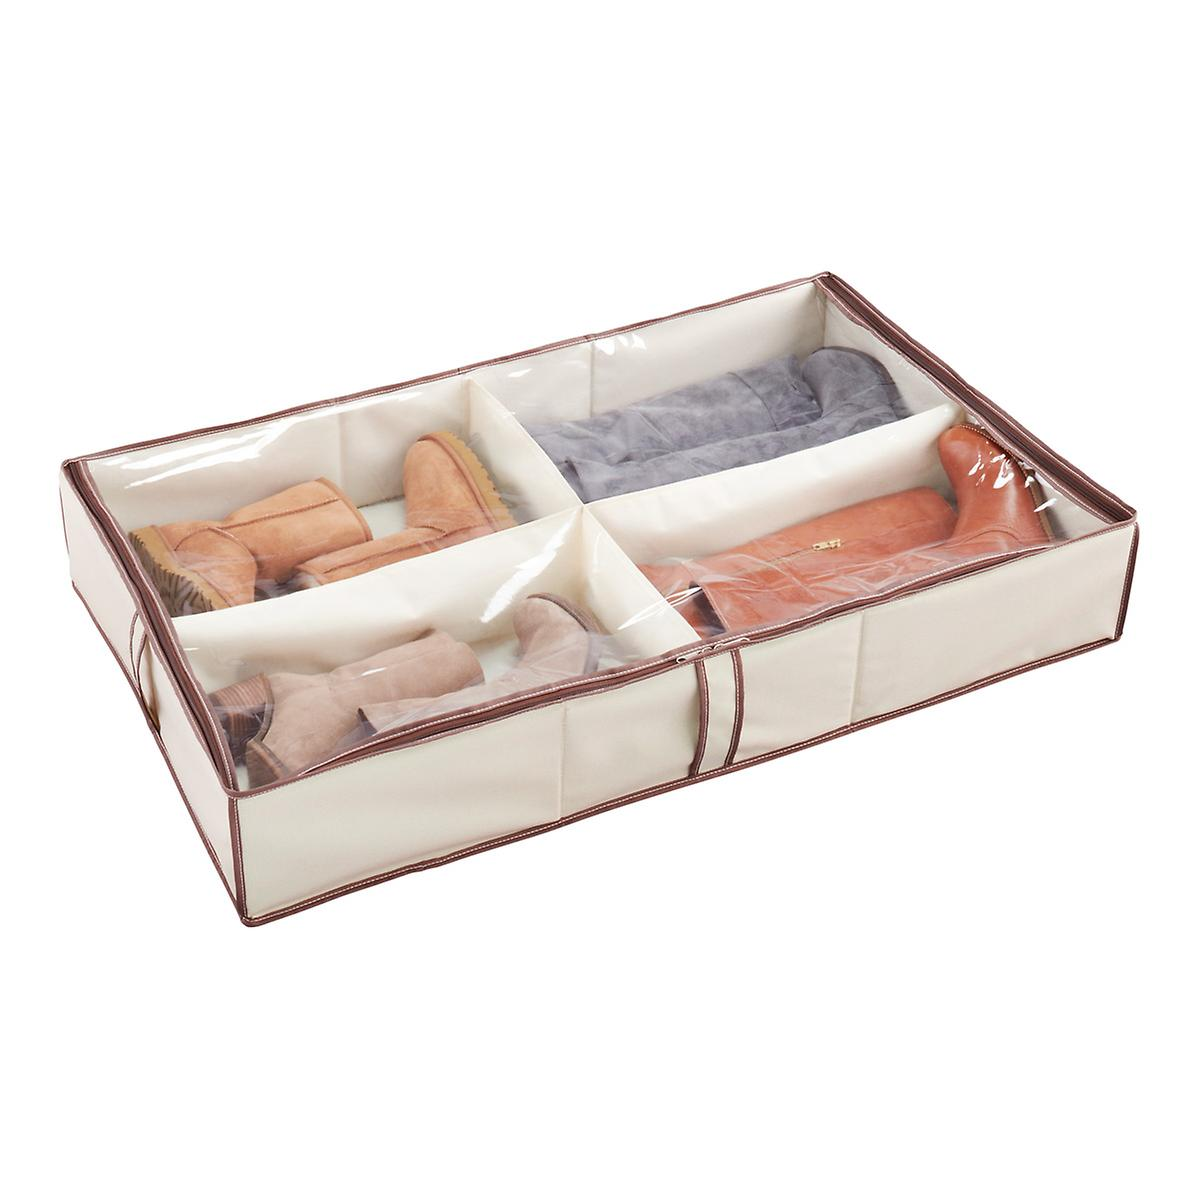 4-Compartment Underbed Shoe Organizer